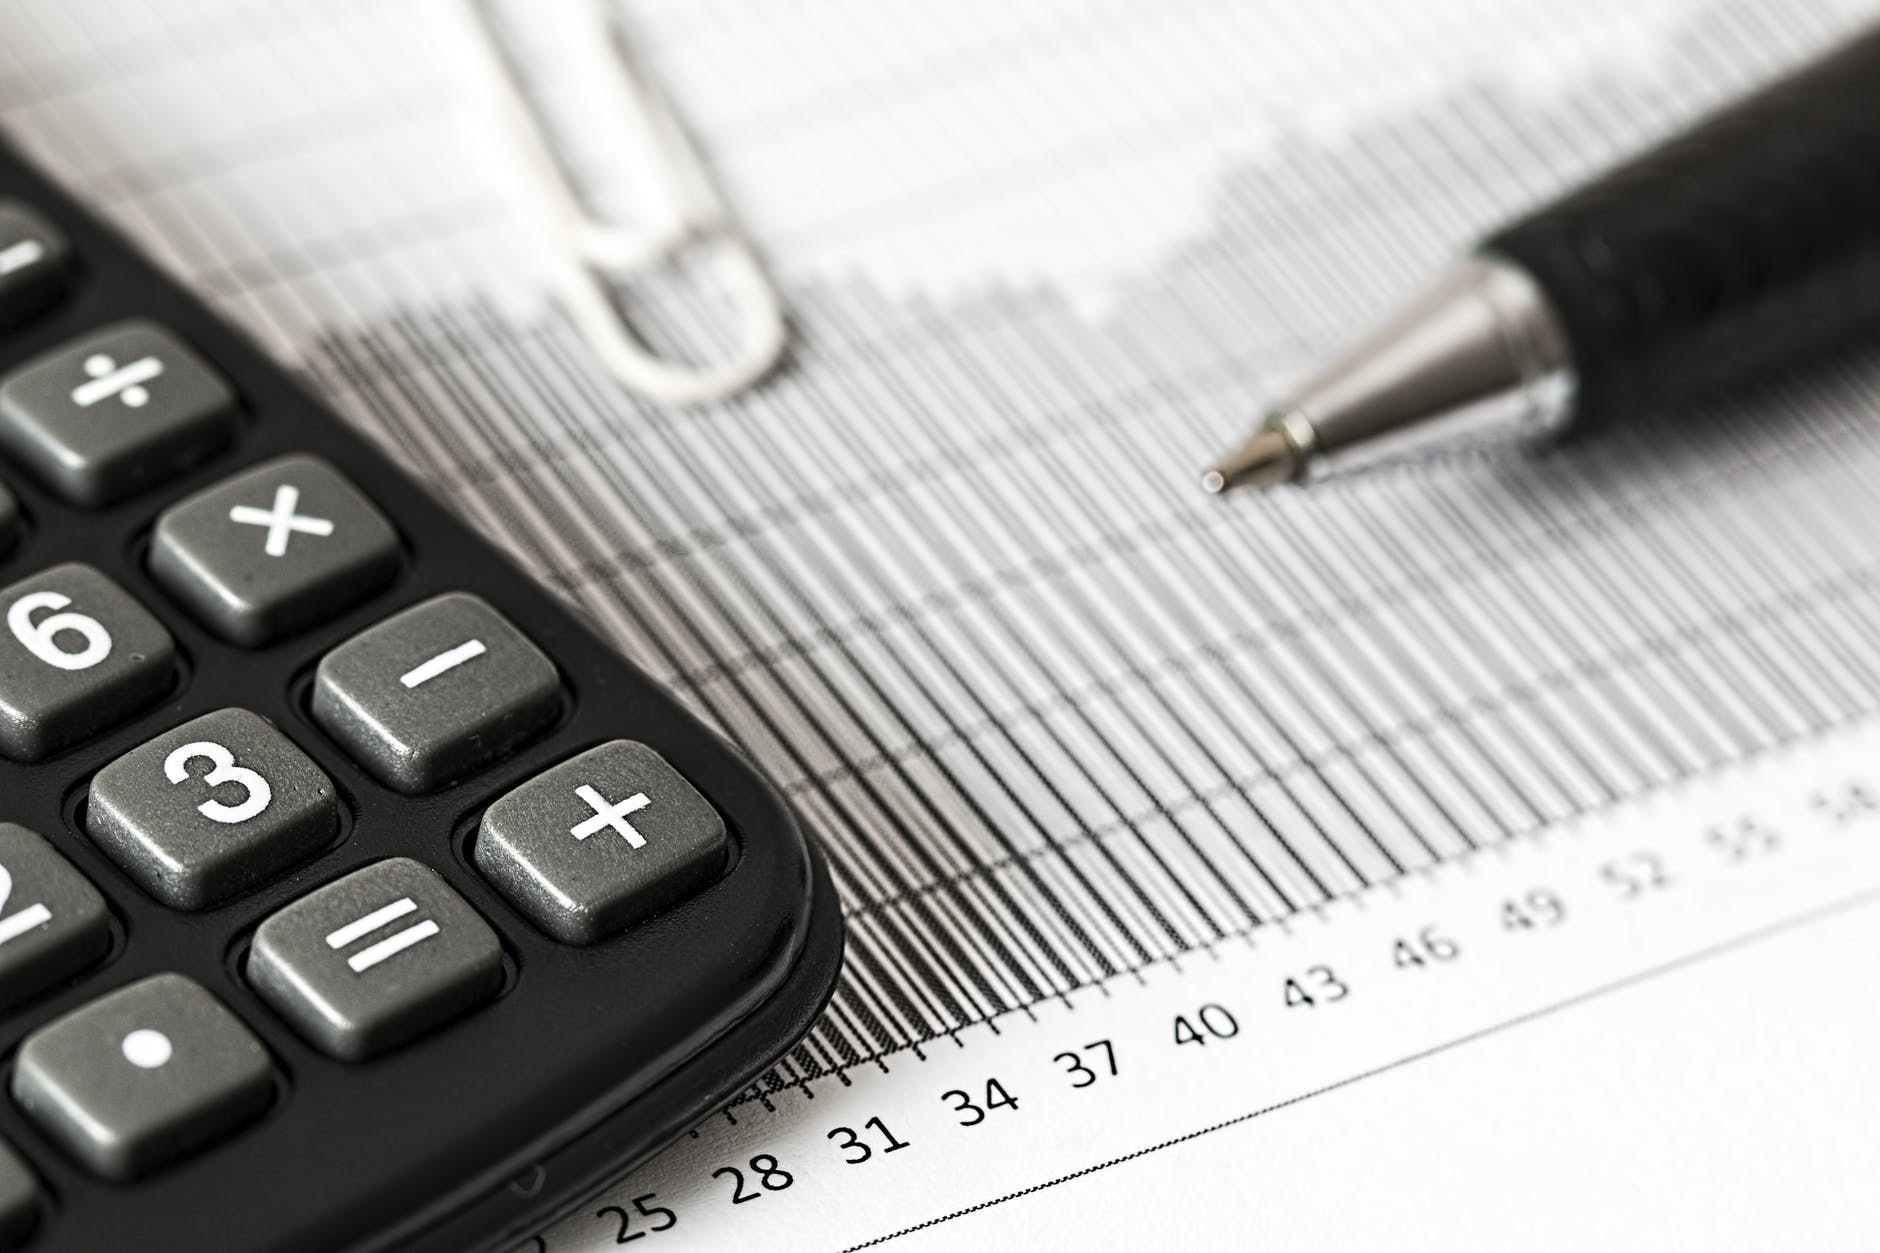 SENS Stock: Senseonics earnings preview, due to report next week